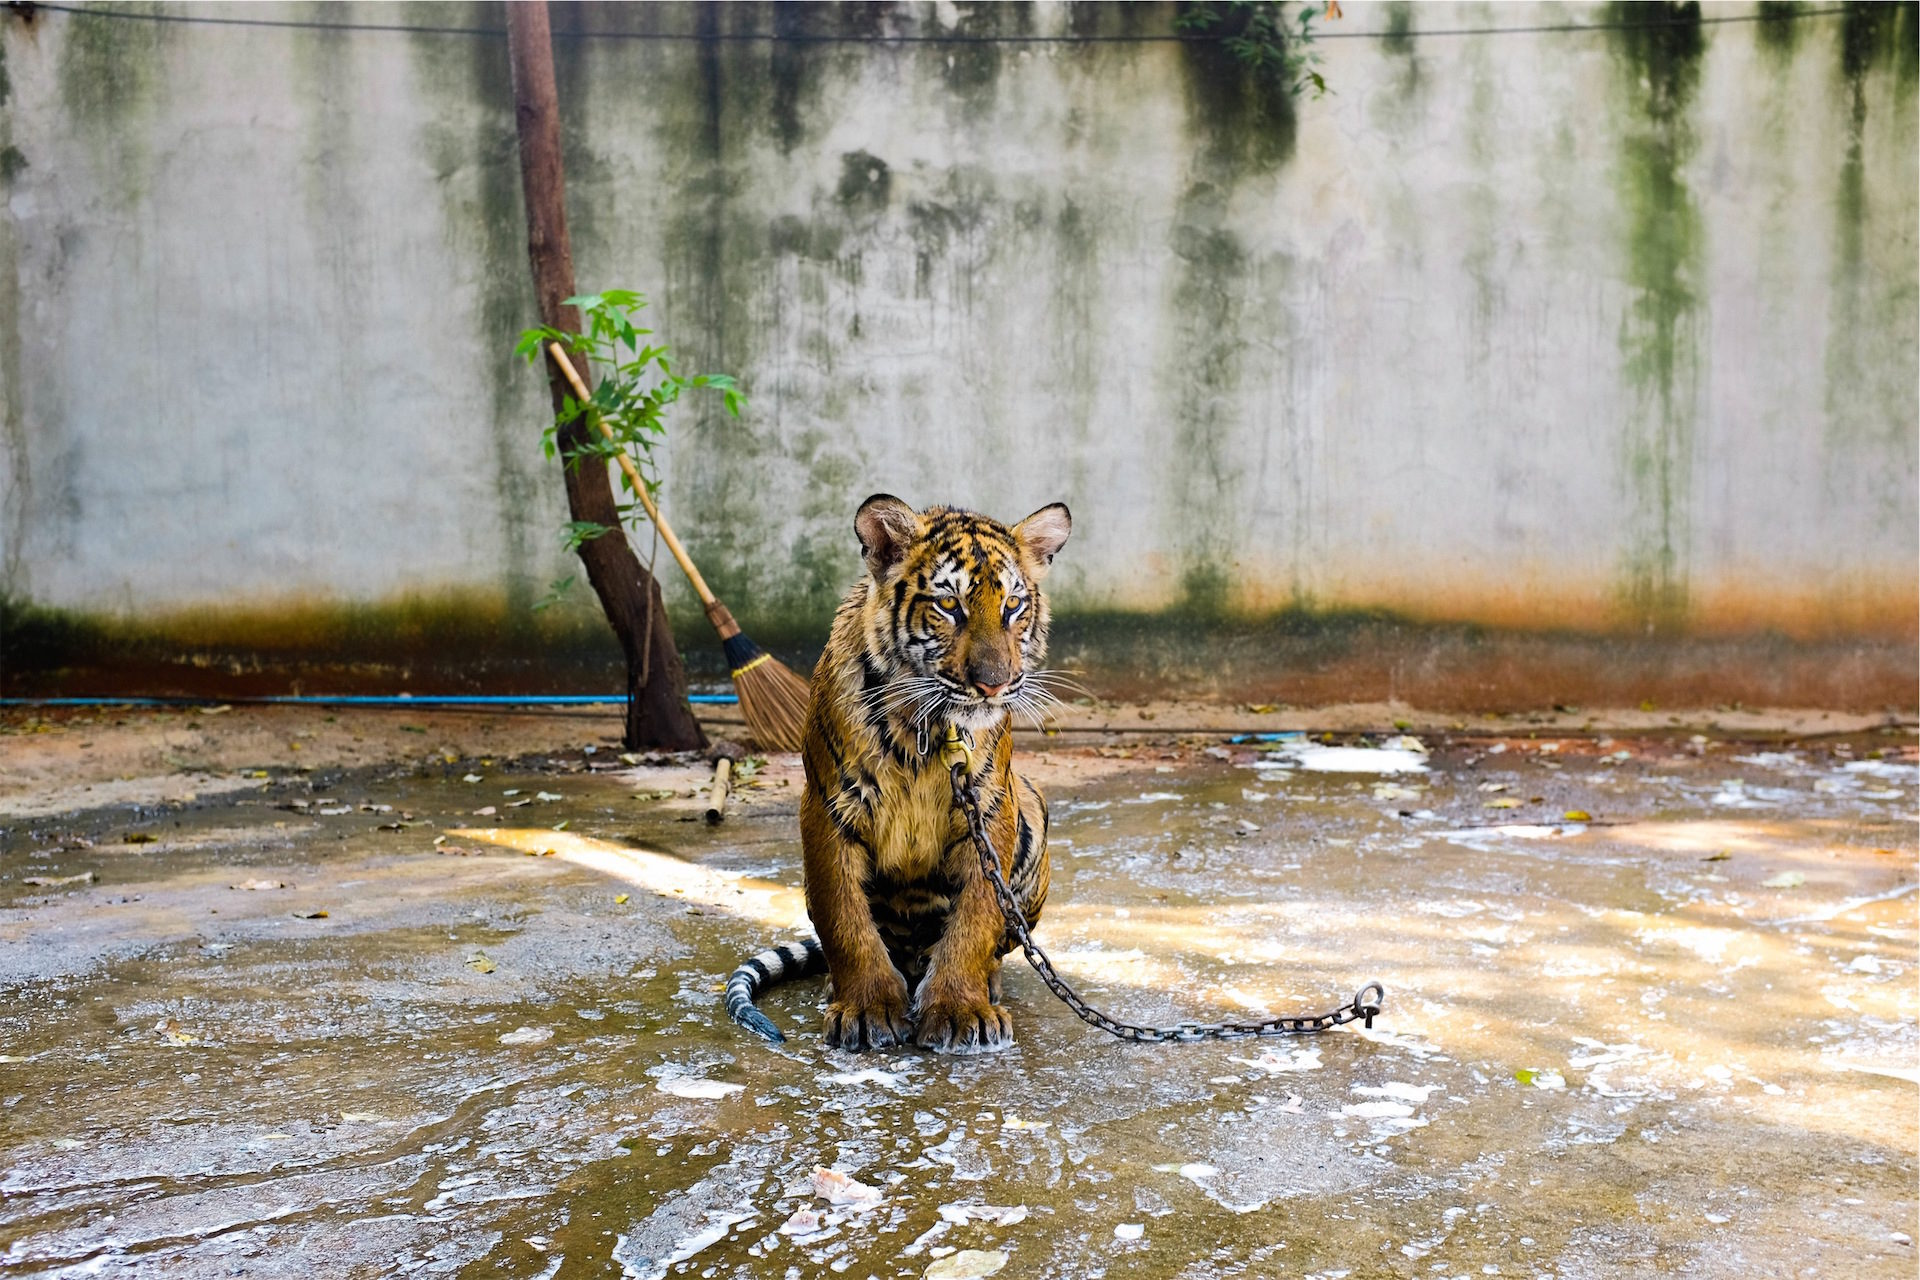 Tiger, in Gefangenschaft, Zoo, Ketten, Blick - Wallpaper HD - Prof.-falken.com